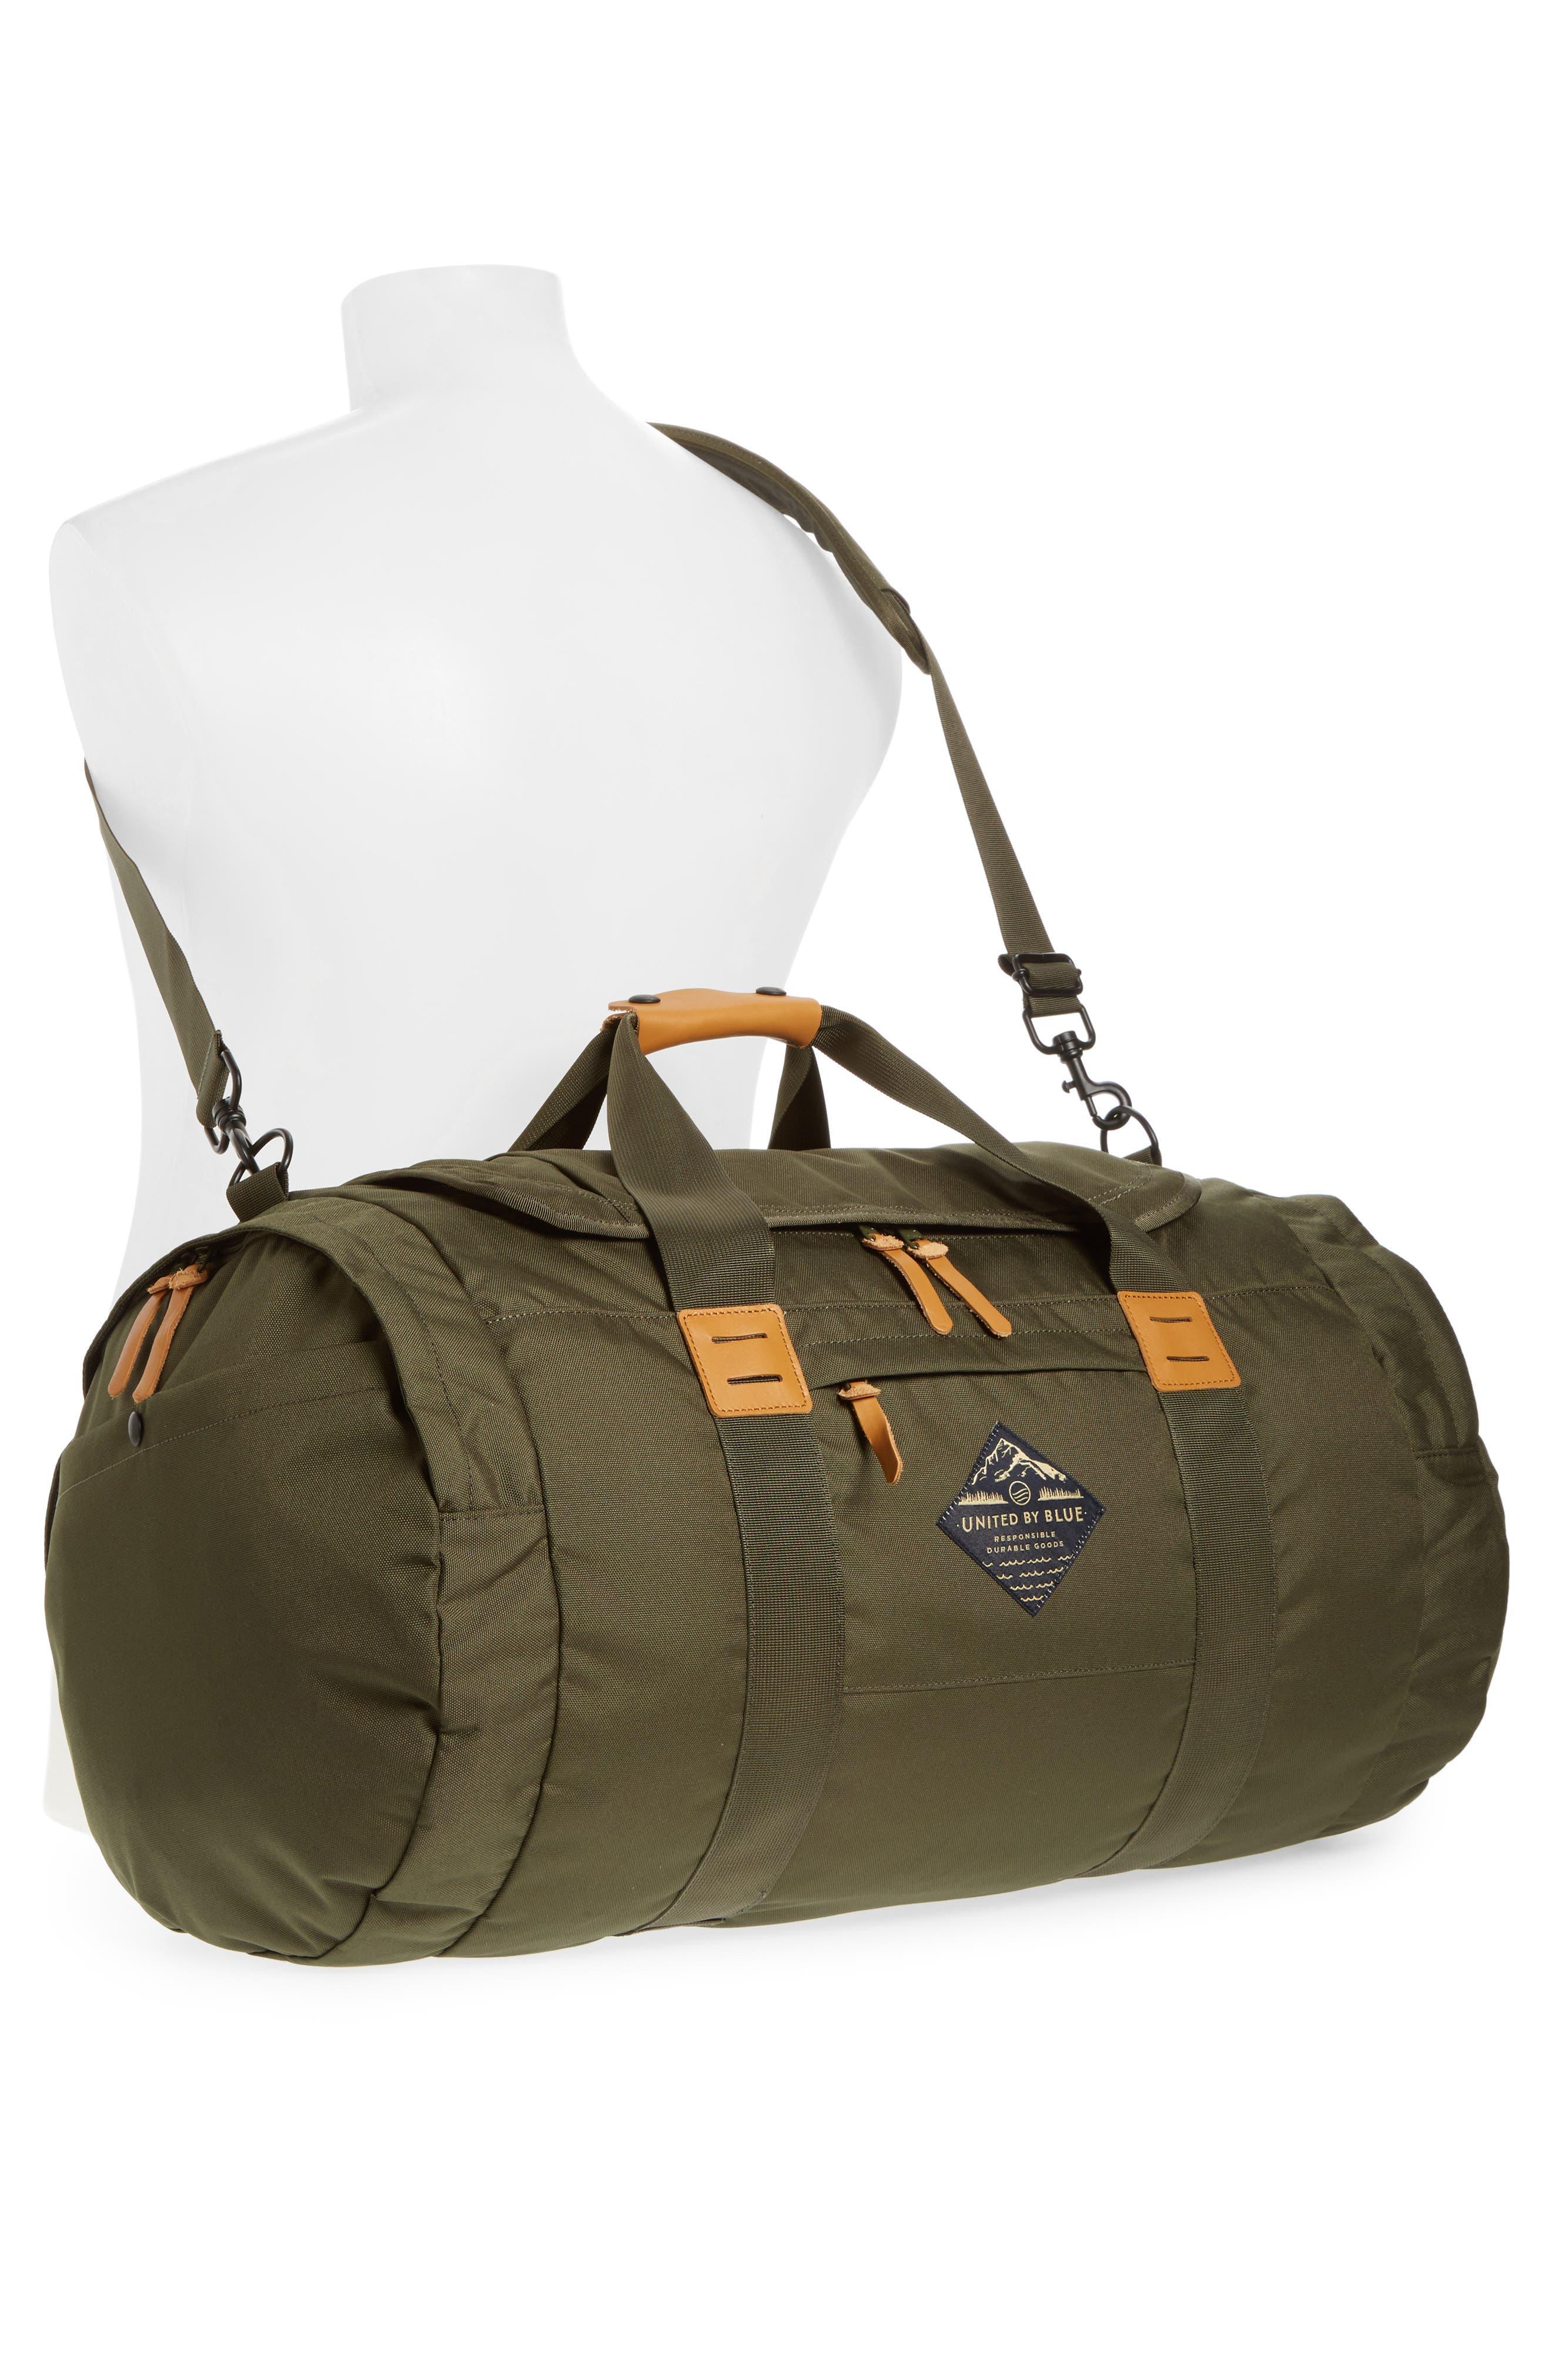 Arc Duffel Bag,                             Alternate thumbnail 2, color,                             Olive